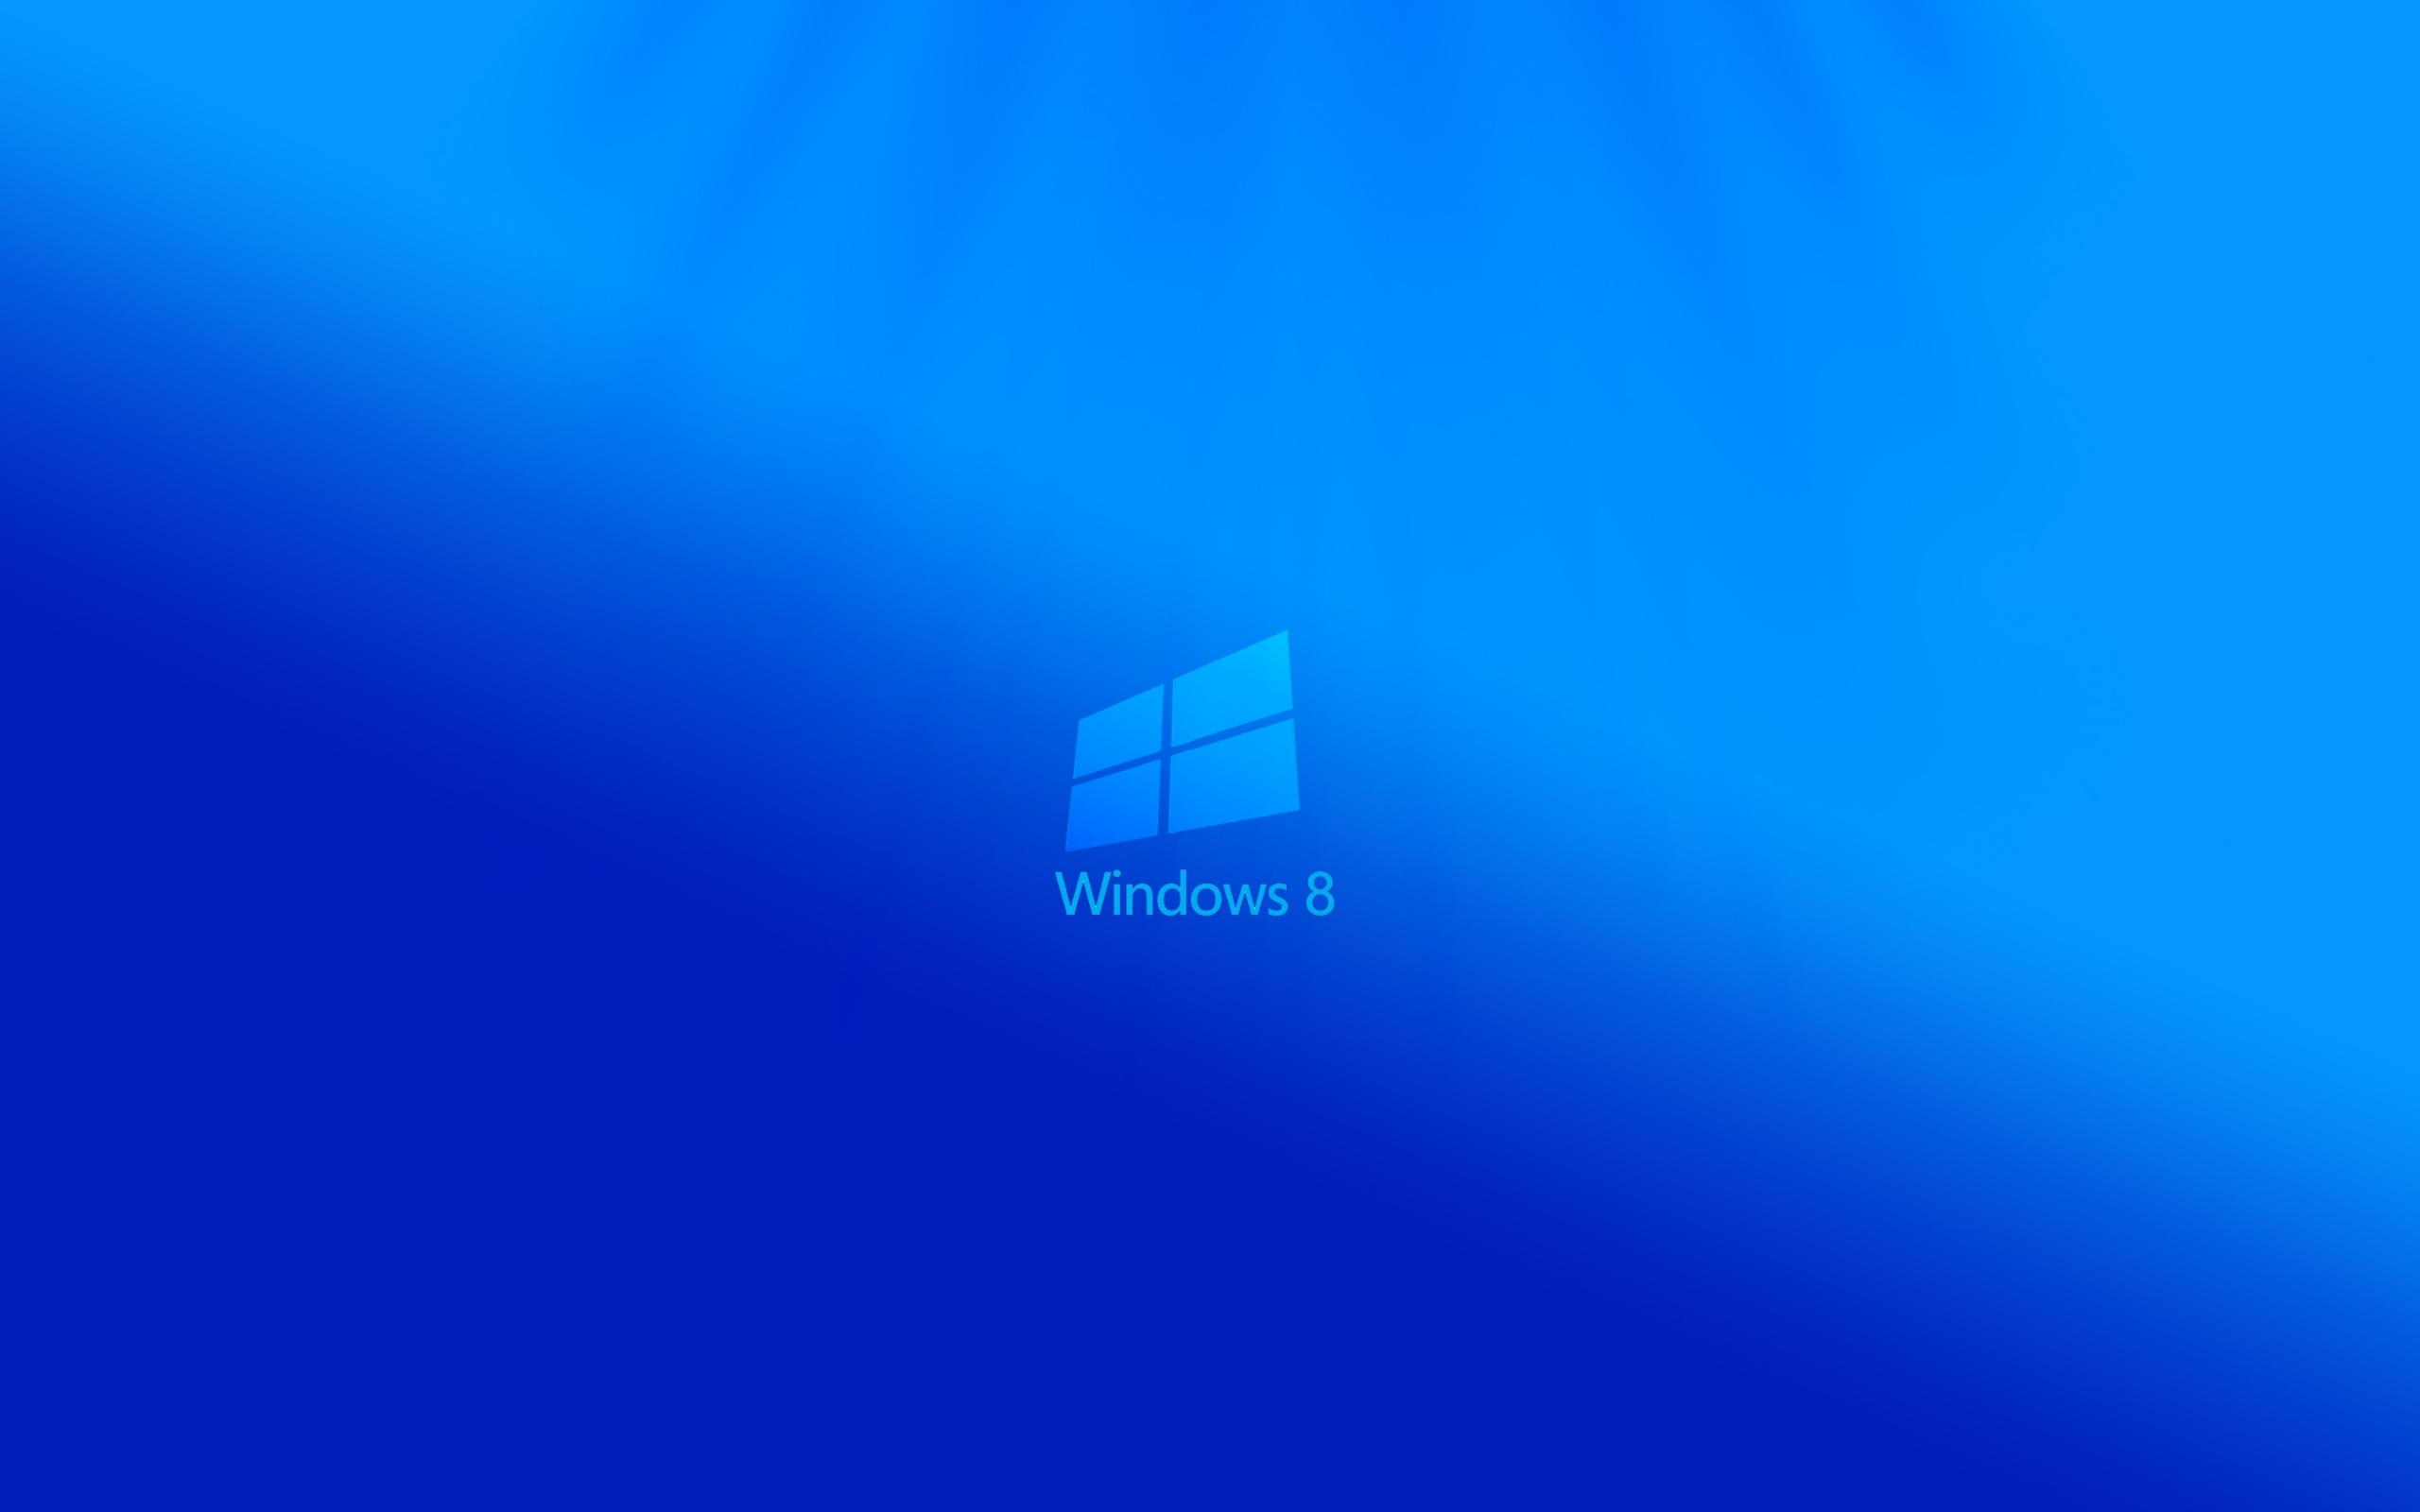 windows 81 Computer Wallpapers Desktop Backgrounds 2560x1600 ID 2560x1600